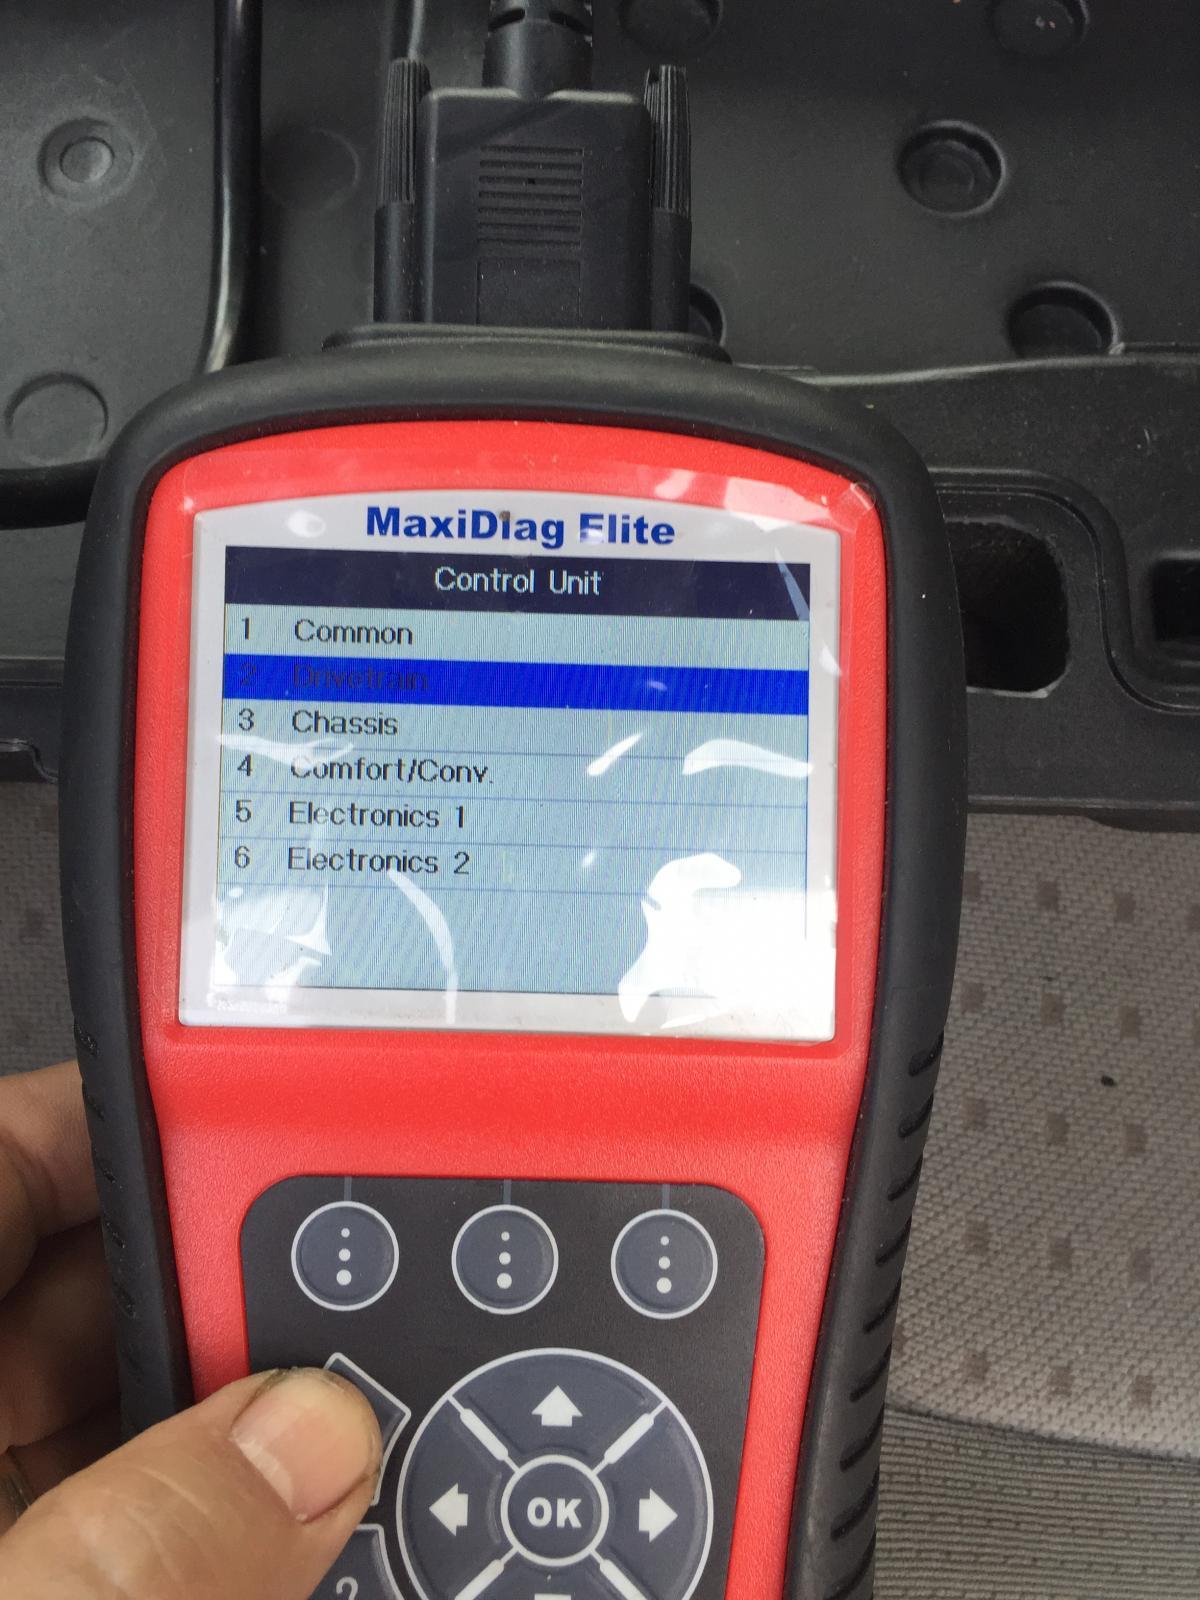 AUTEL transmission scan